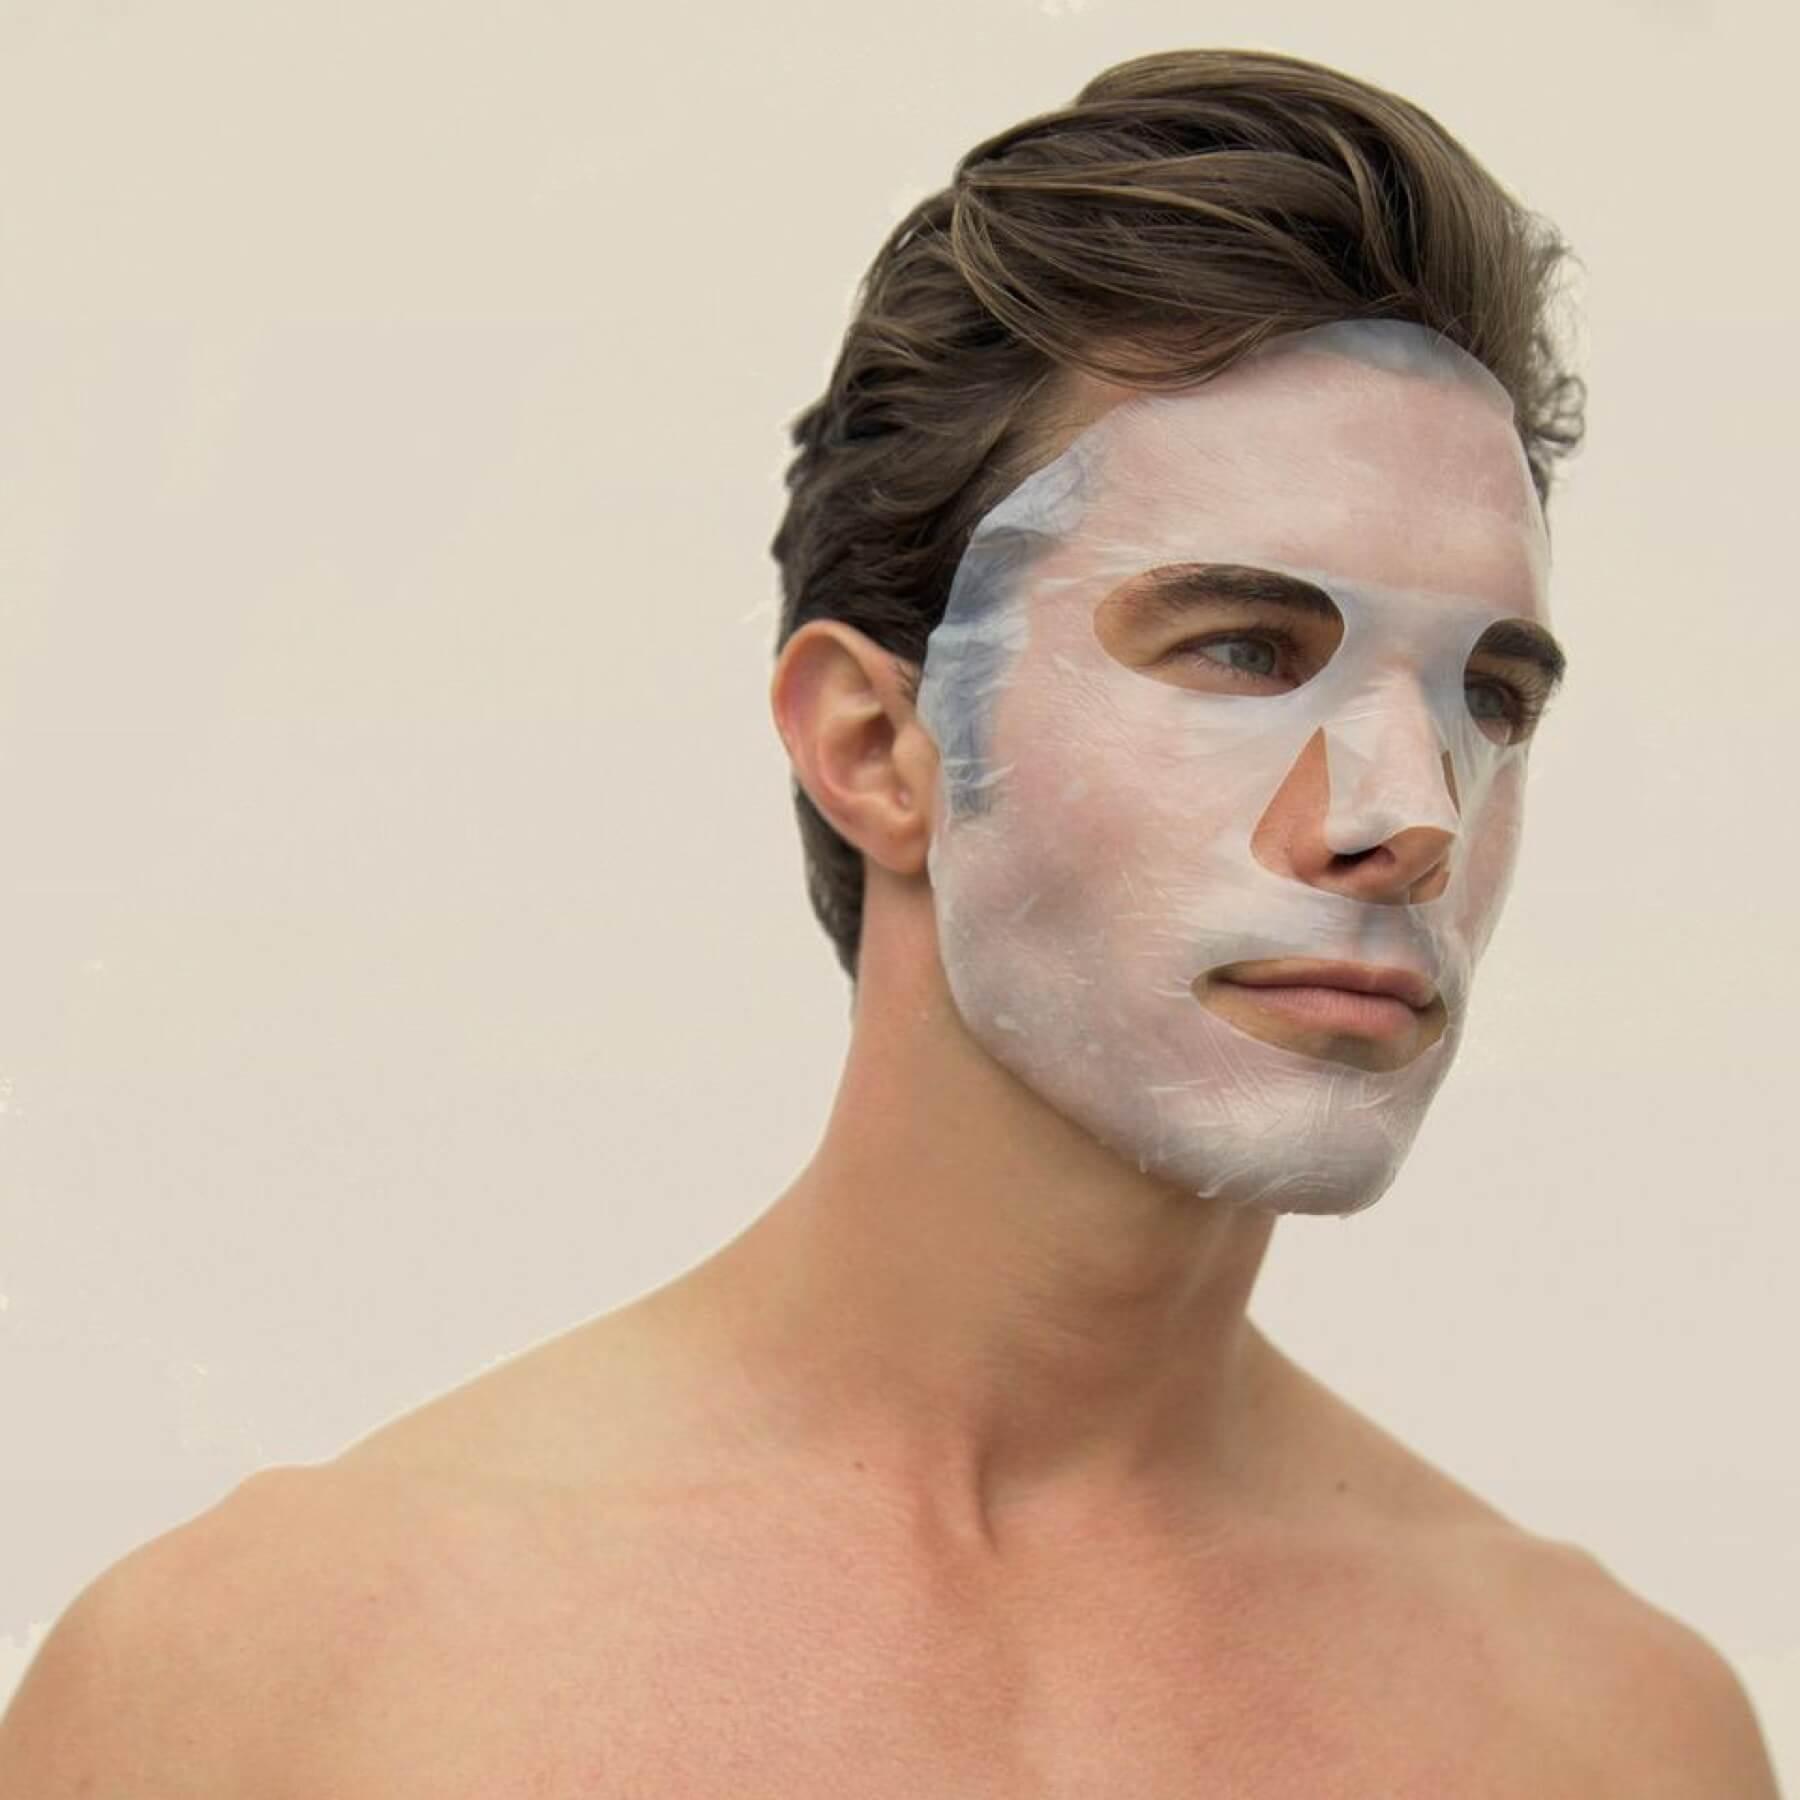 Port Products' Marine Layer Sheet Masks